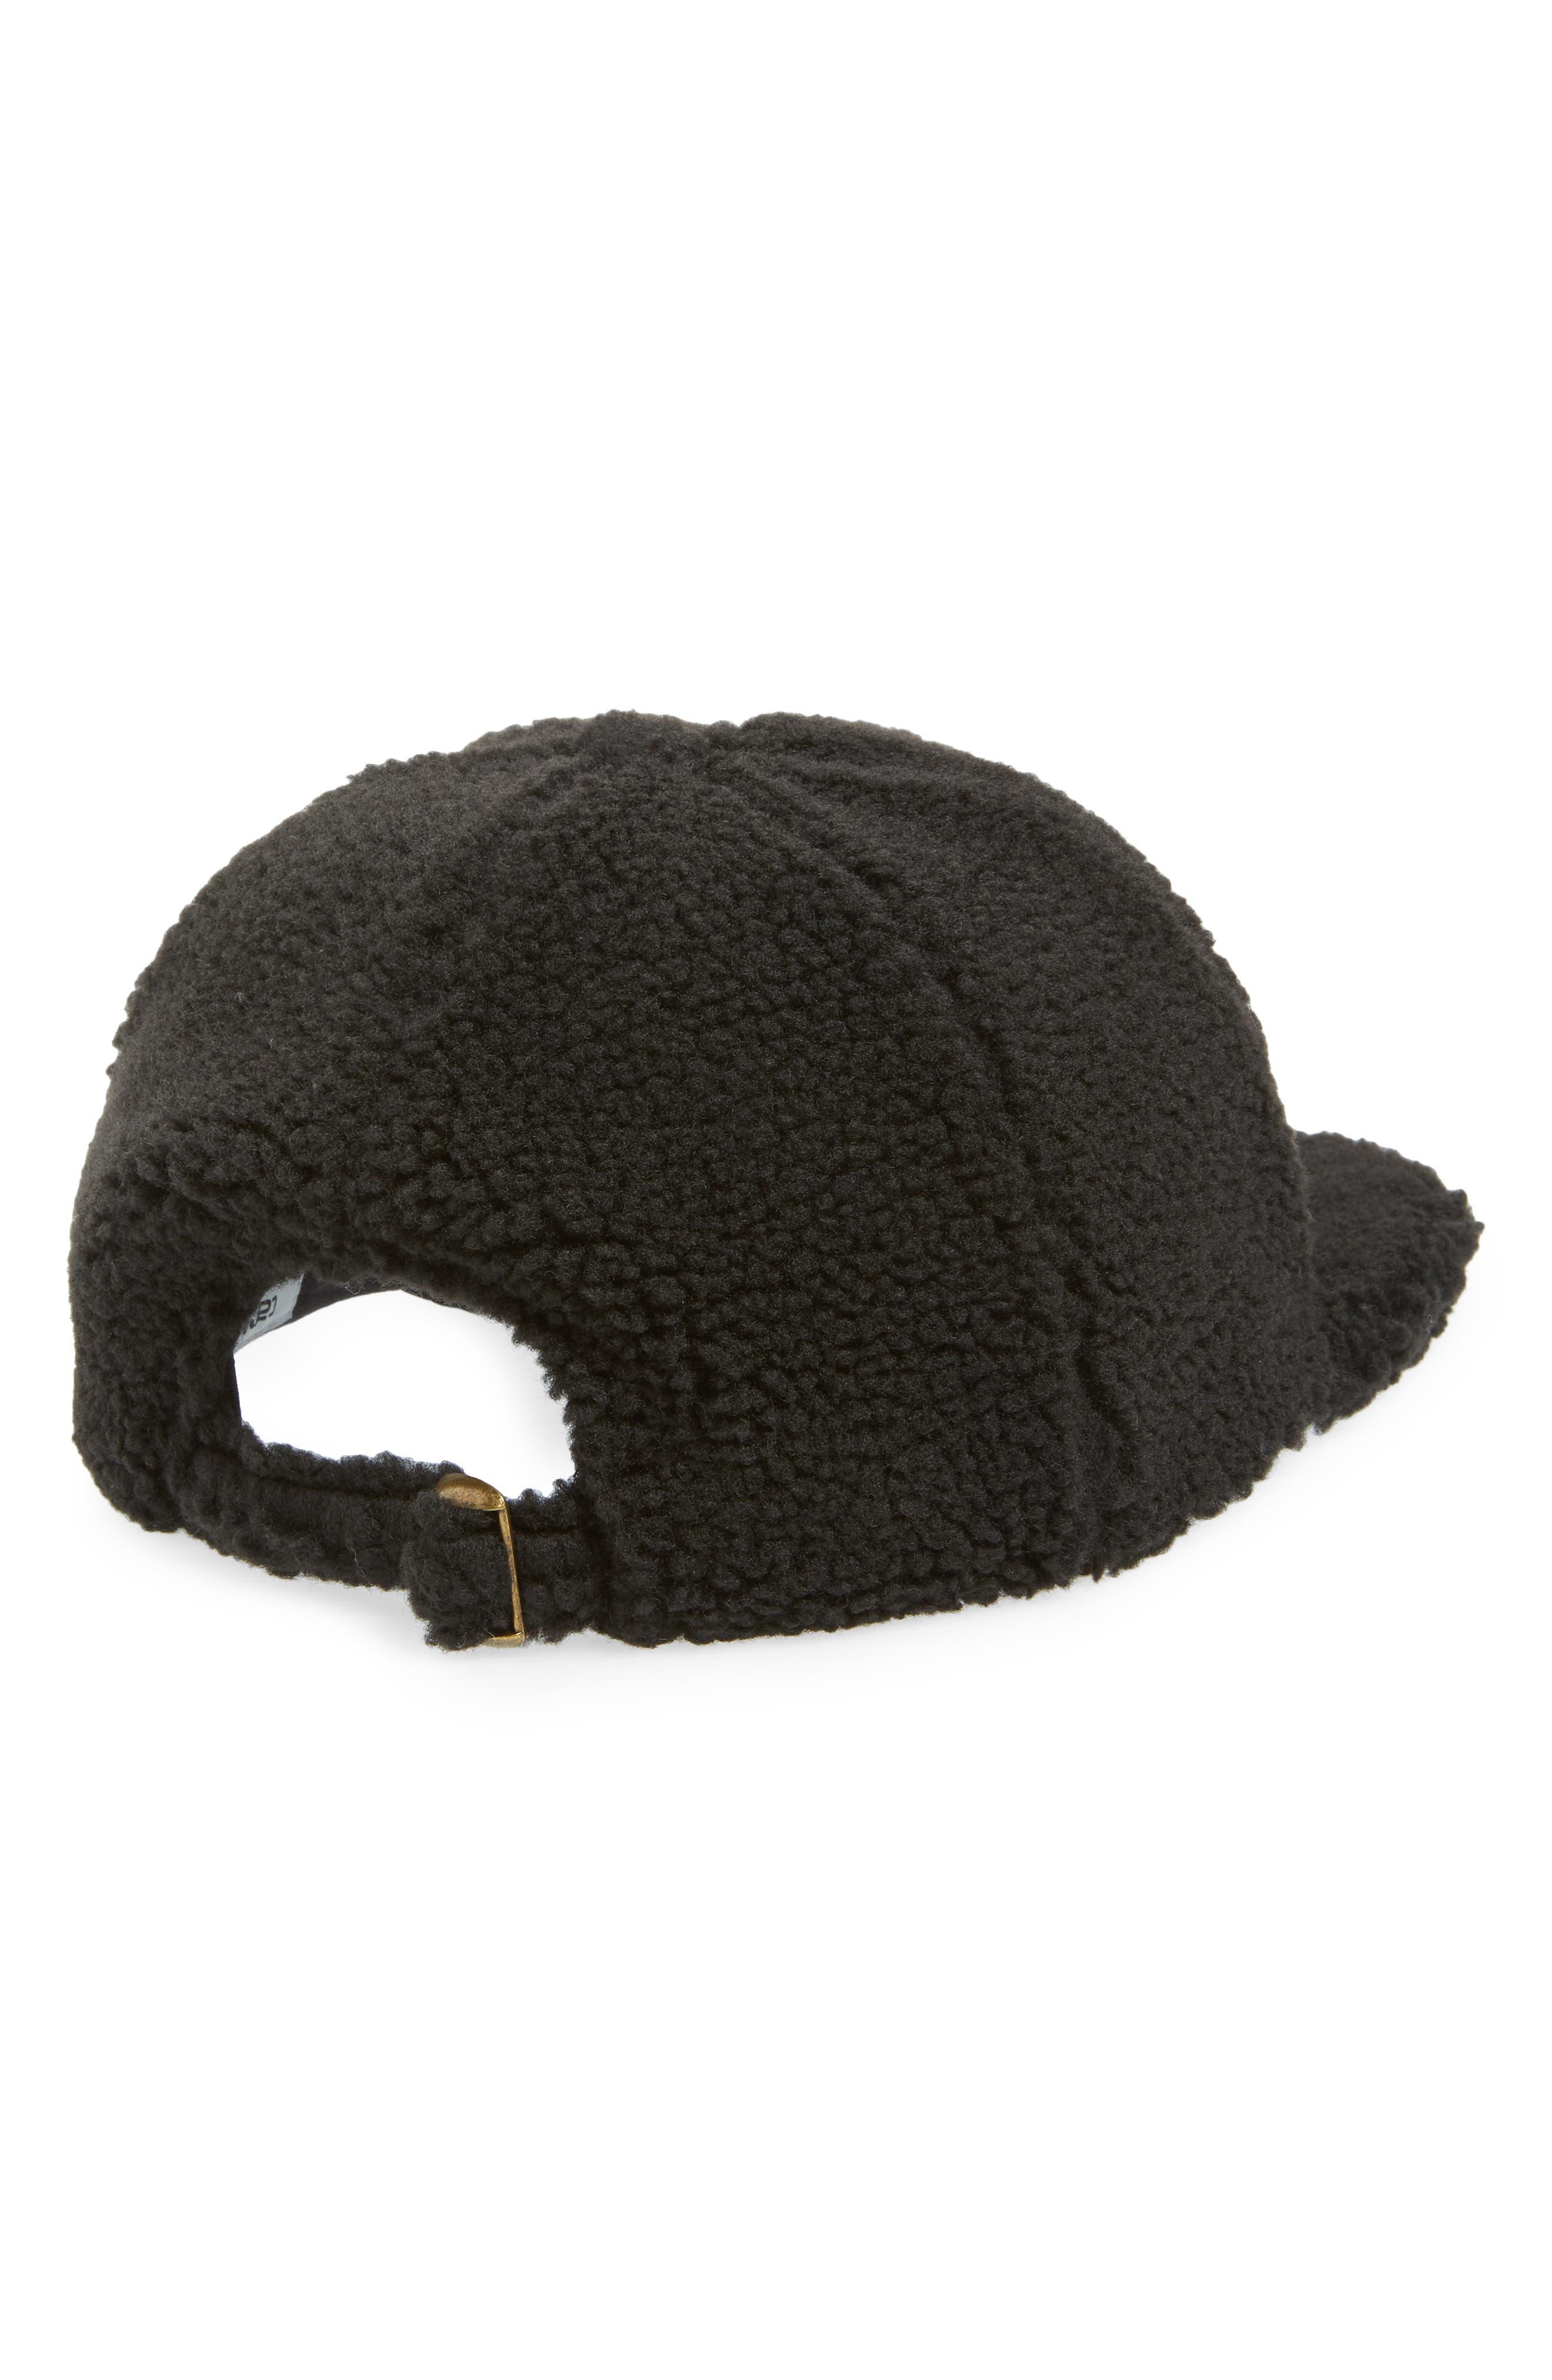 Pile Faux Shearling Cap,                             Alternate thumbnail 2, color,                             BLACK / WAX